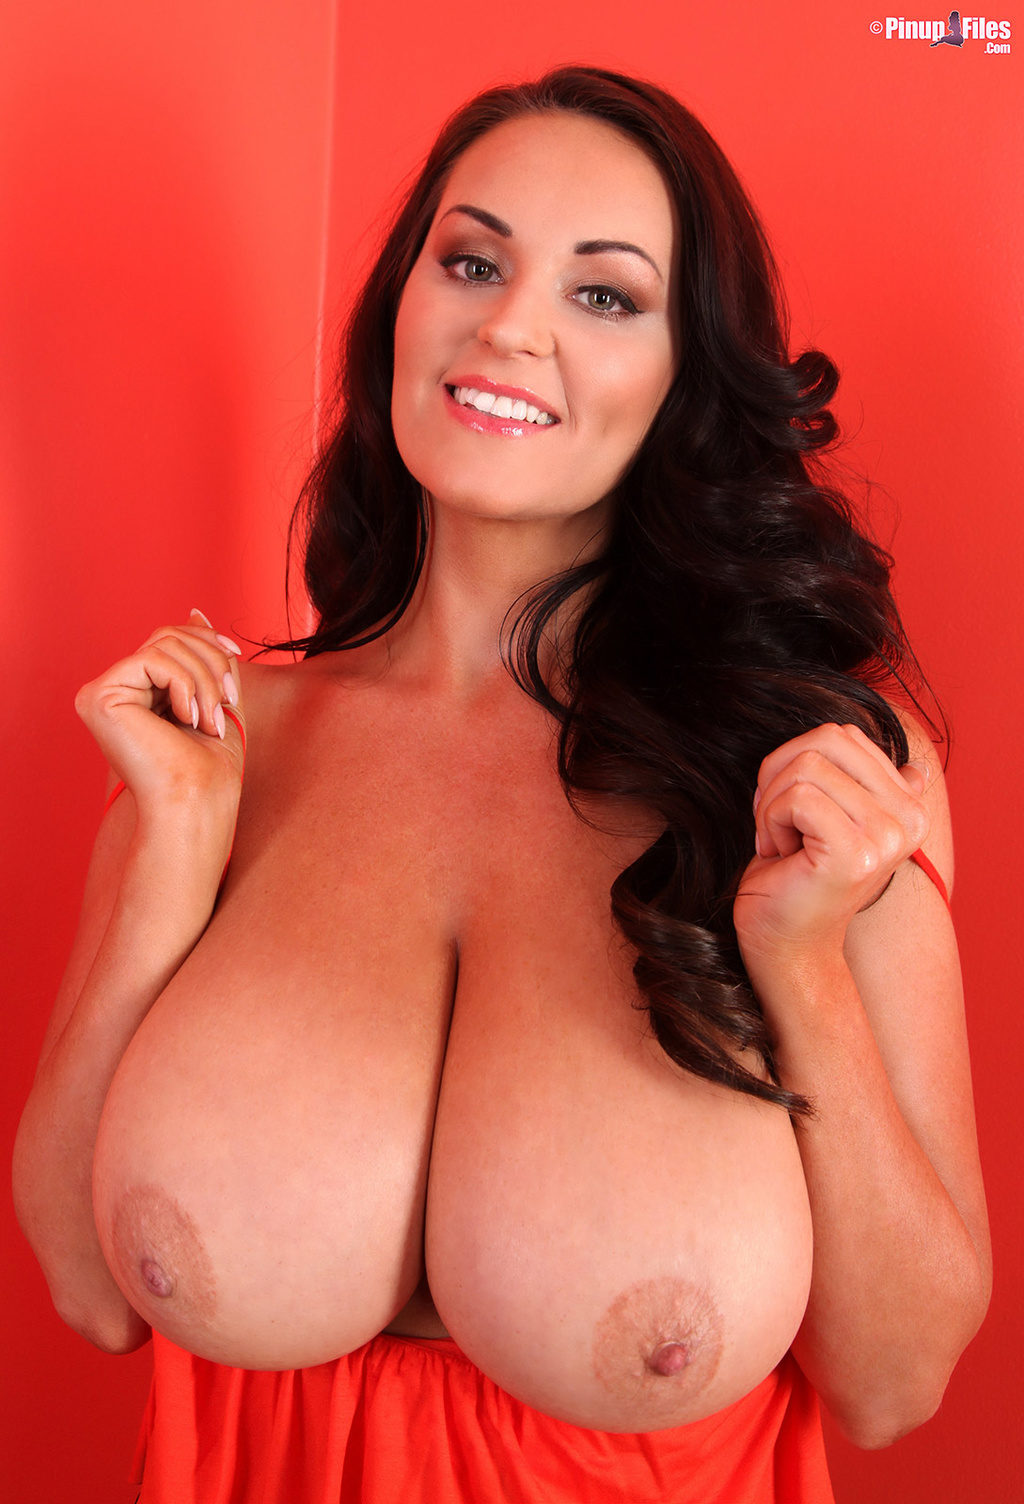 sarah nicola randall big tits